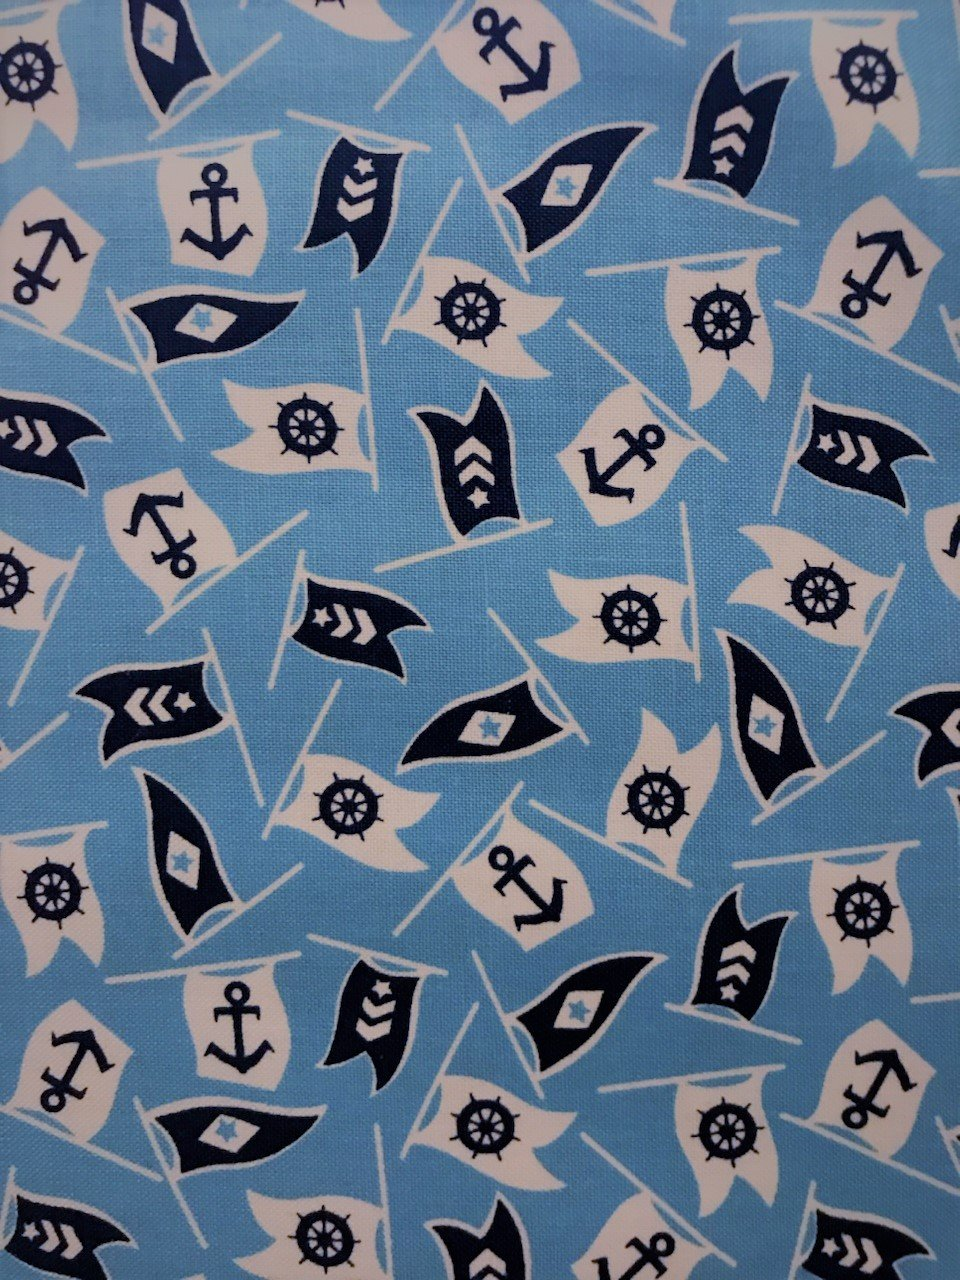 Bon Boyage 42864-4 Nautical Flags Blue